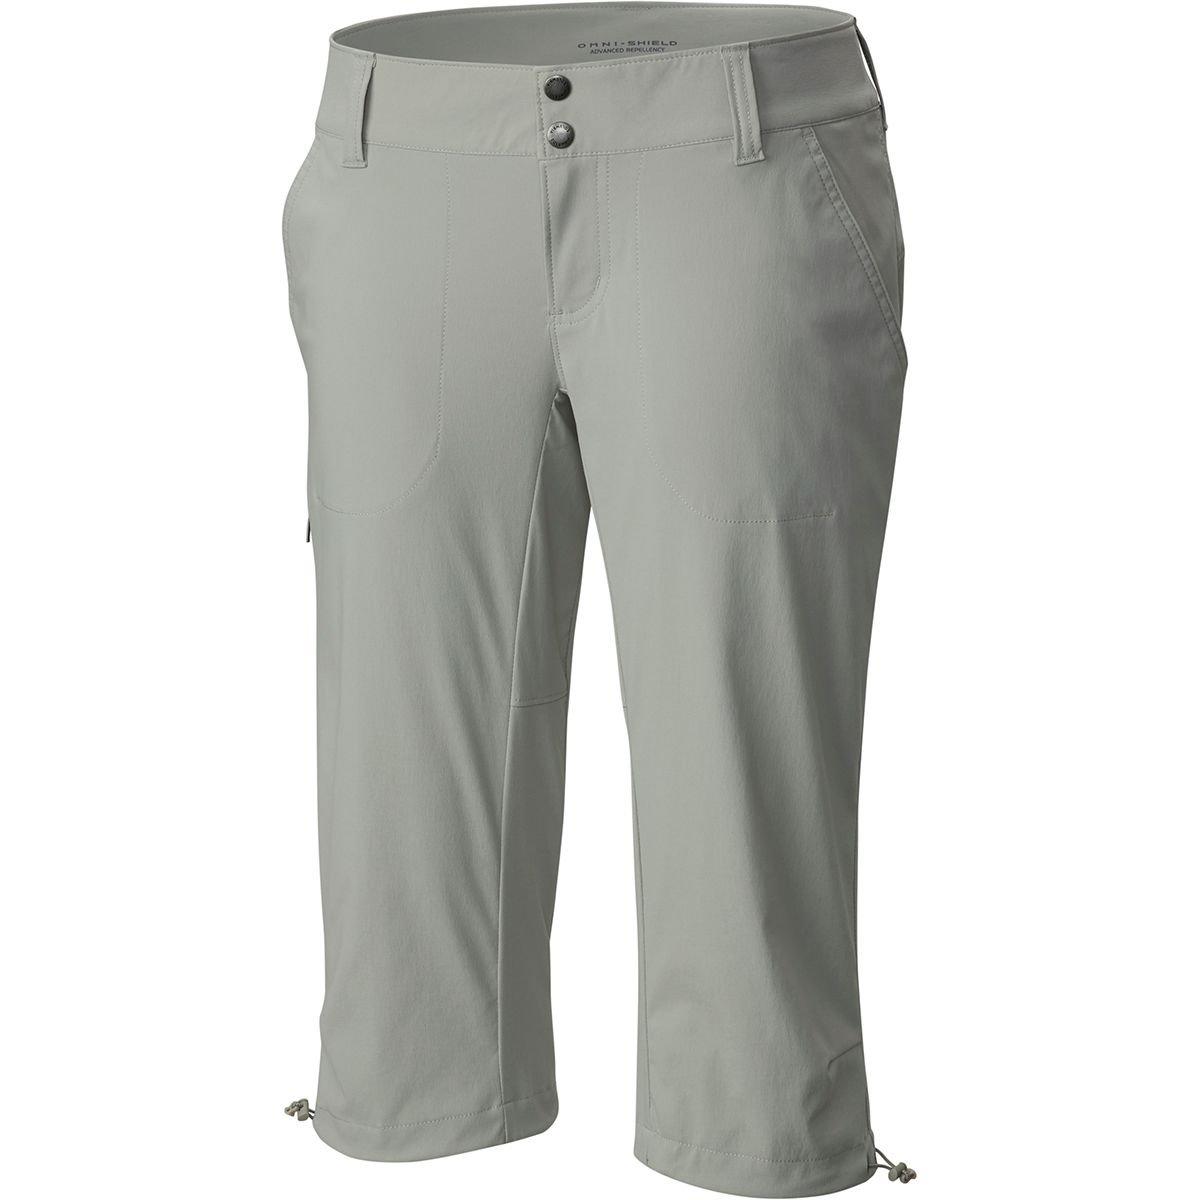 Columbia Women's Saturday Trail II Knee Pant, Water & Stain Resistant,Flint Grey,8 X 18'' inseam by Columbia